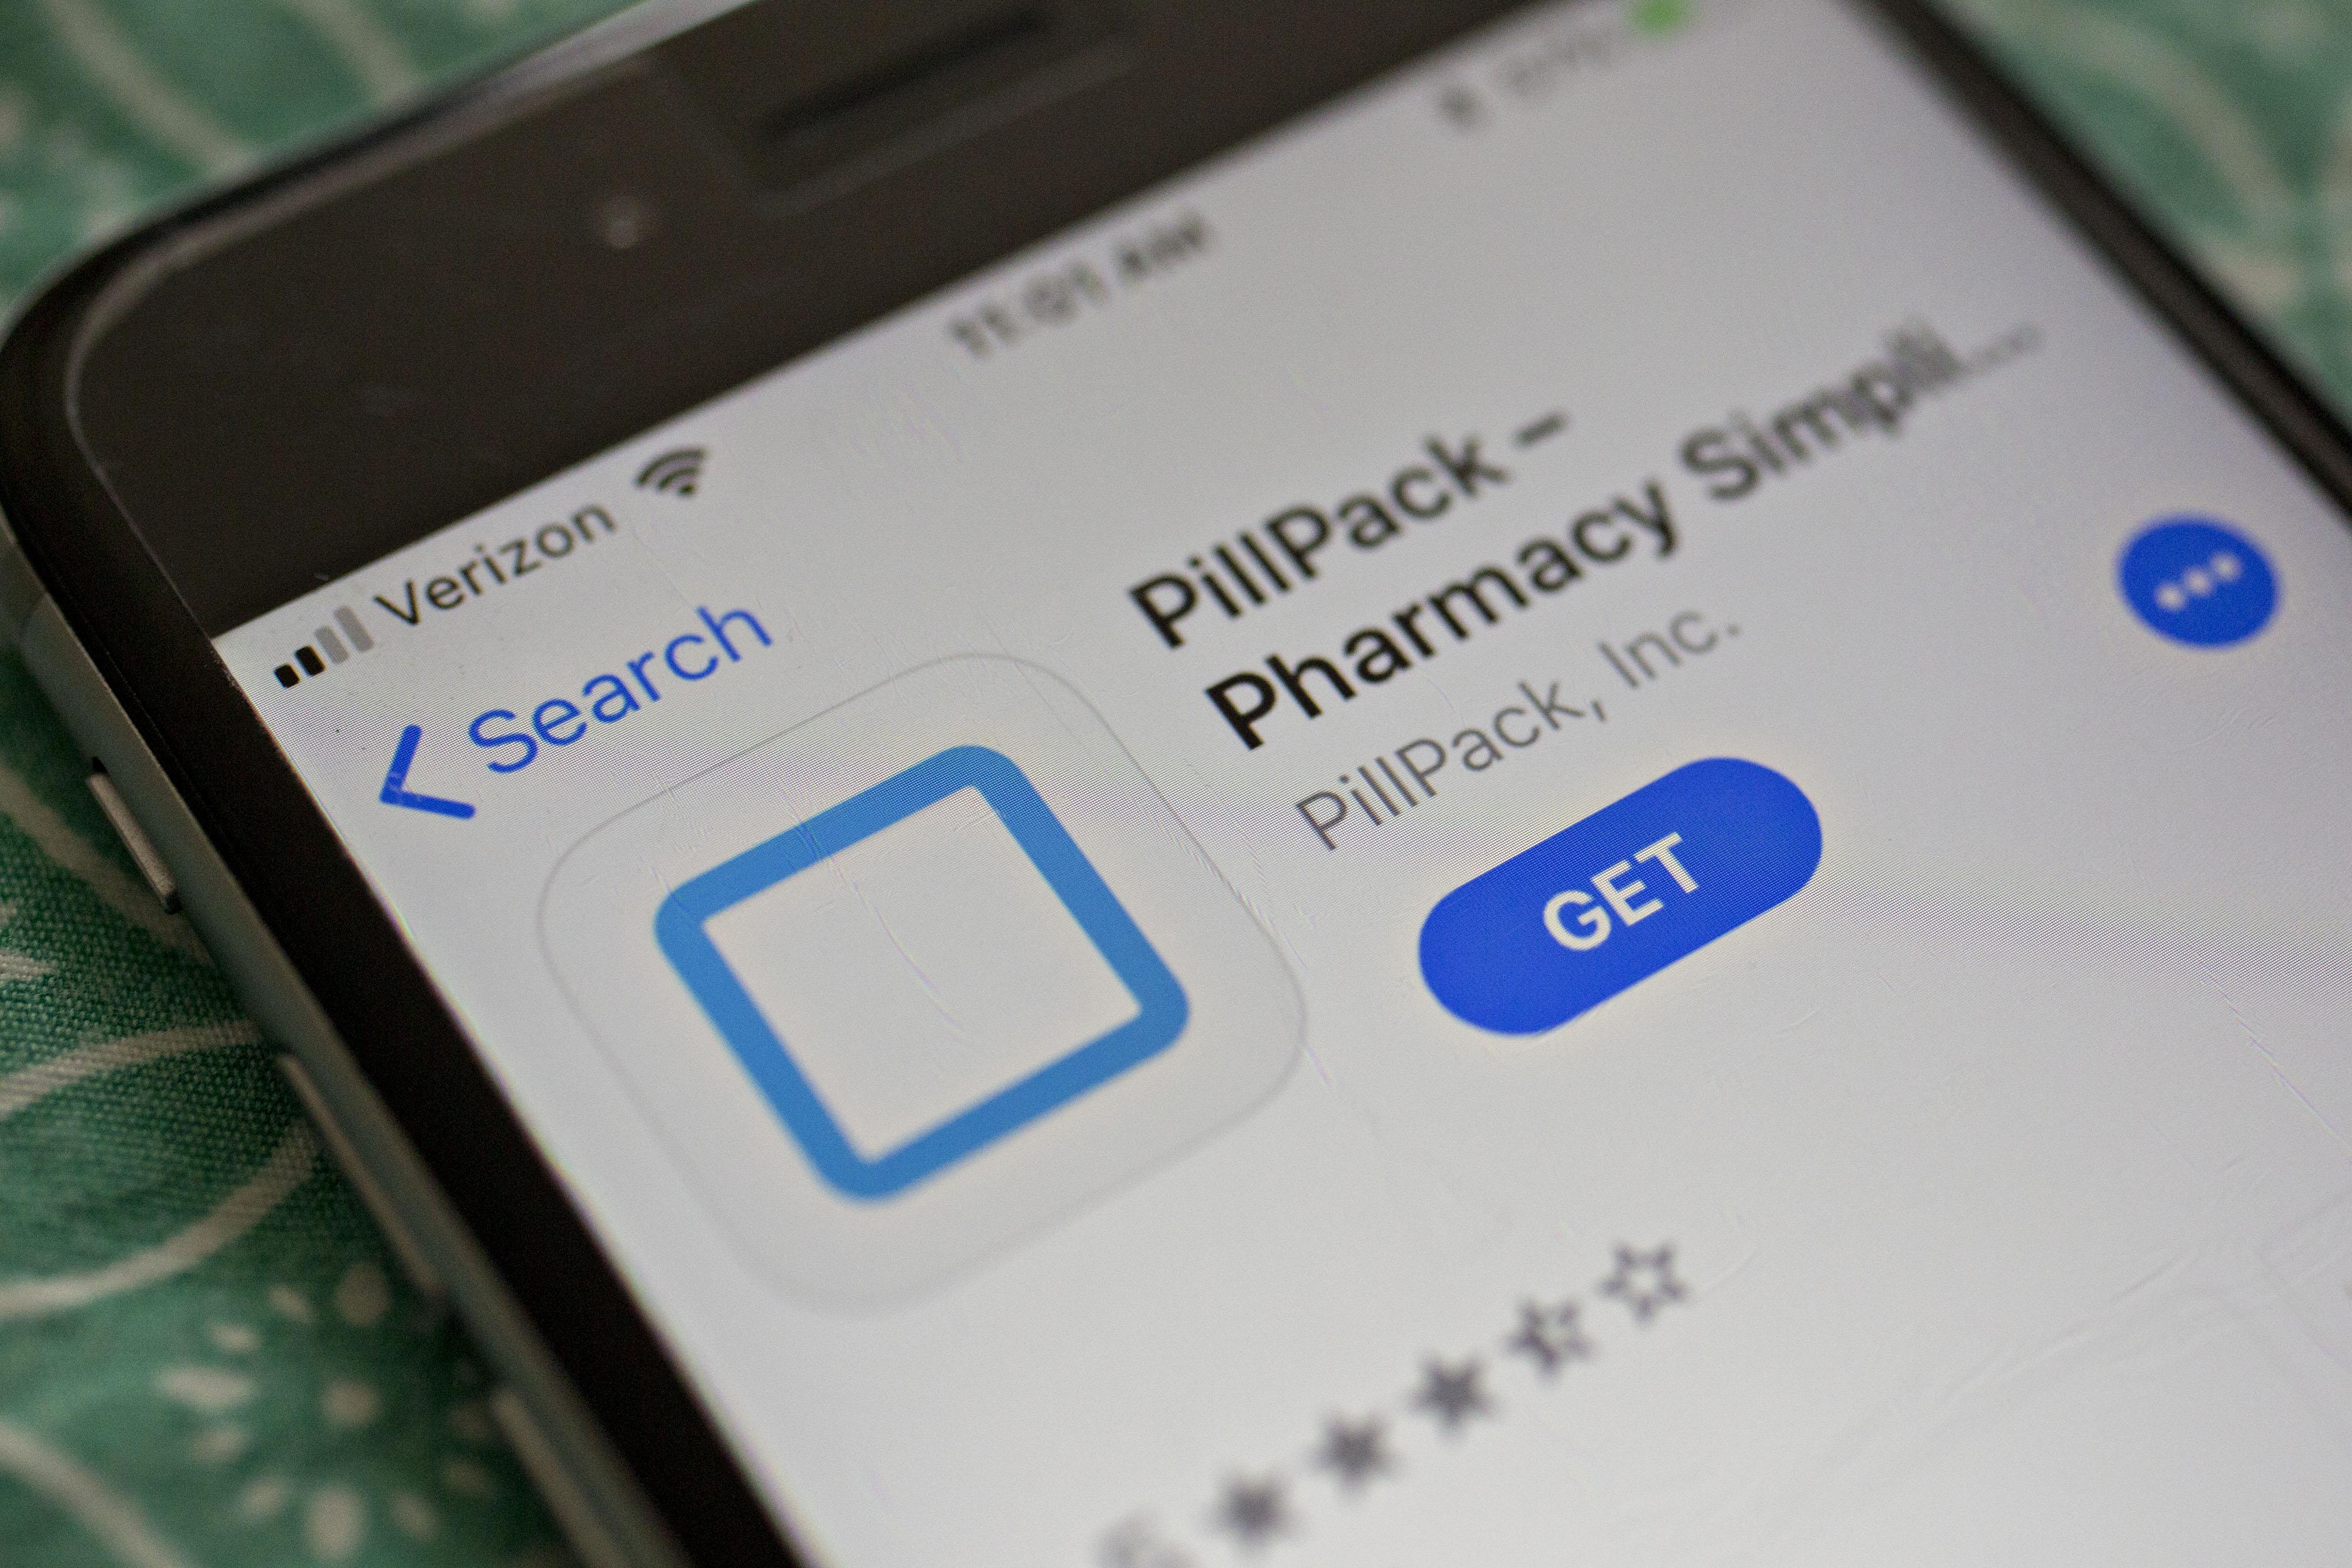 Amazon PillPack Surescripts